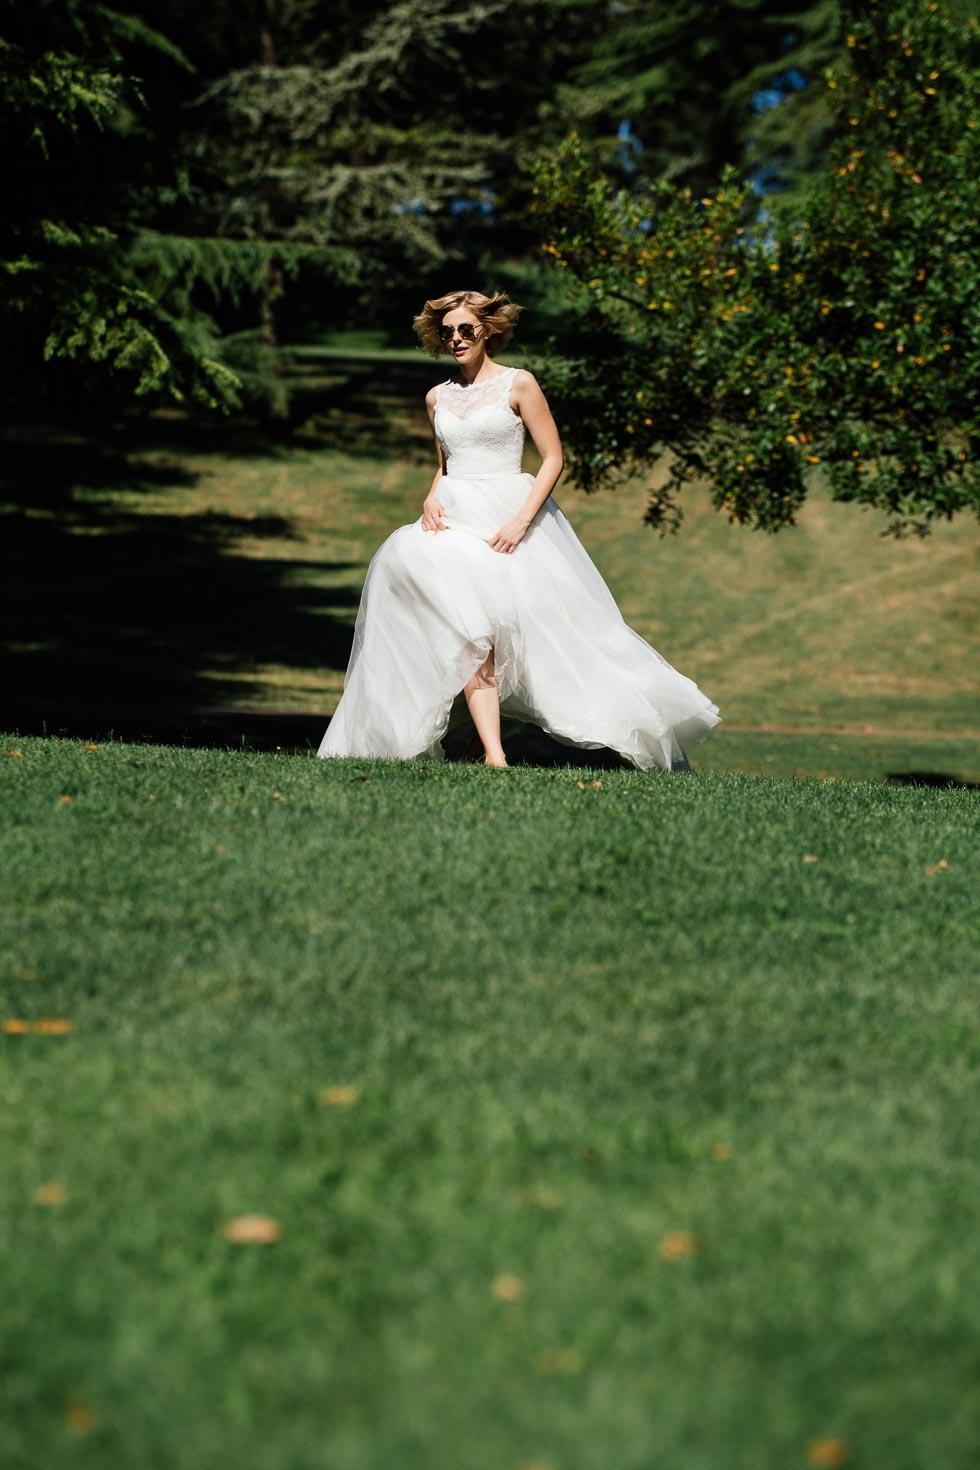 Küss die Braut Brautkleider Xenja